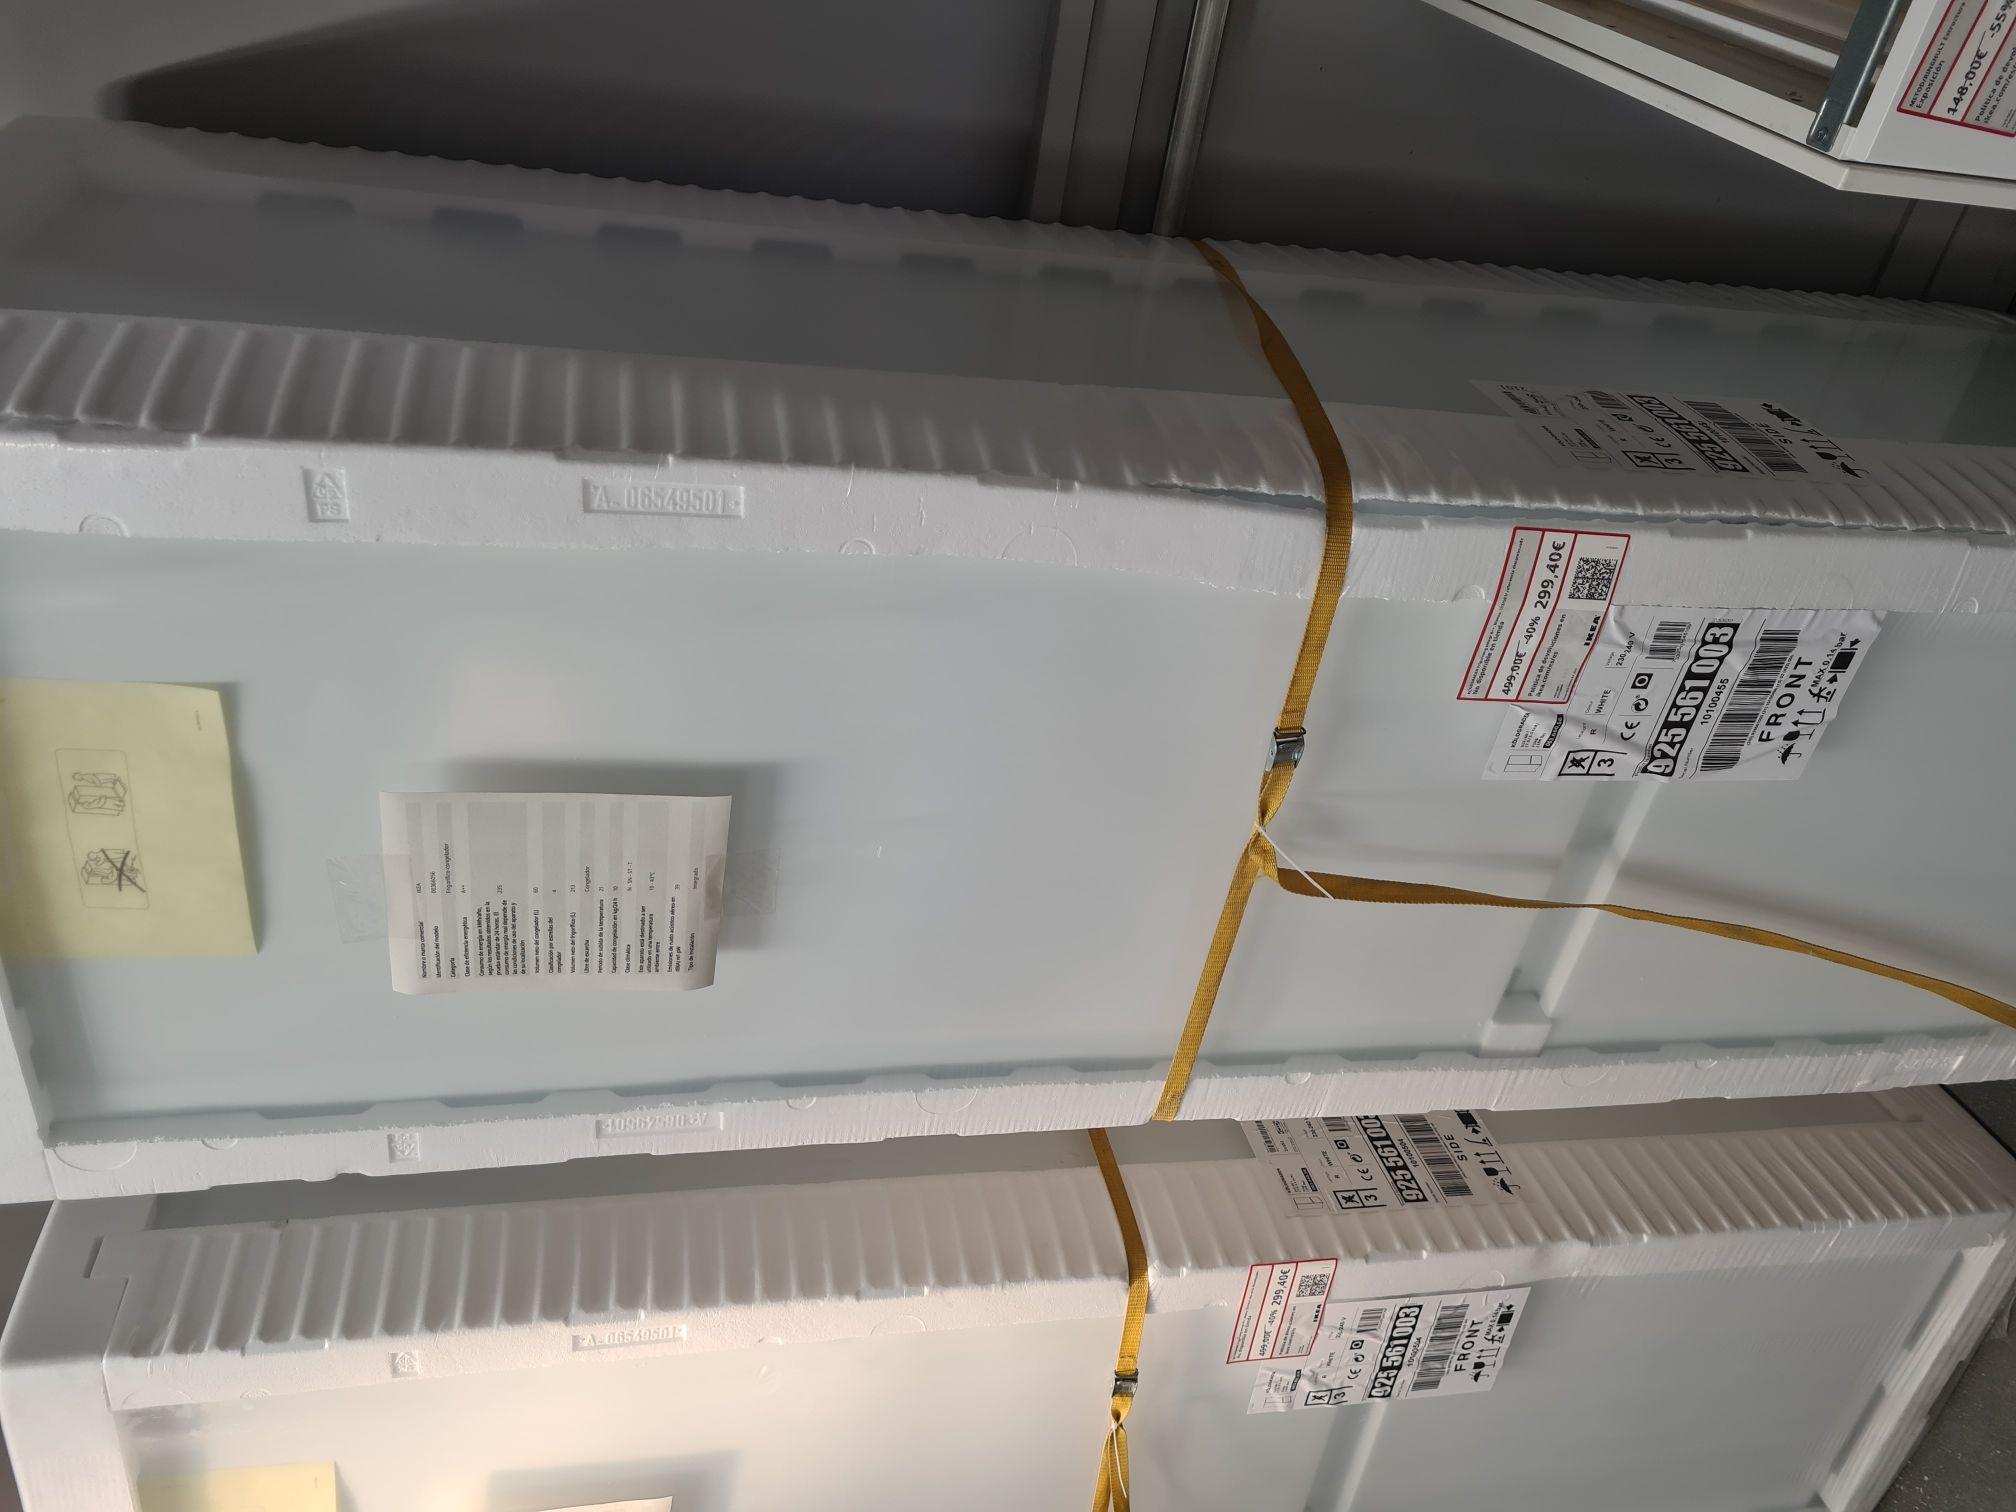 KÖLDGRADER Combi integrable IKEA CORUÑA